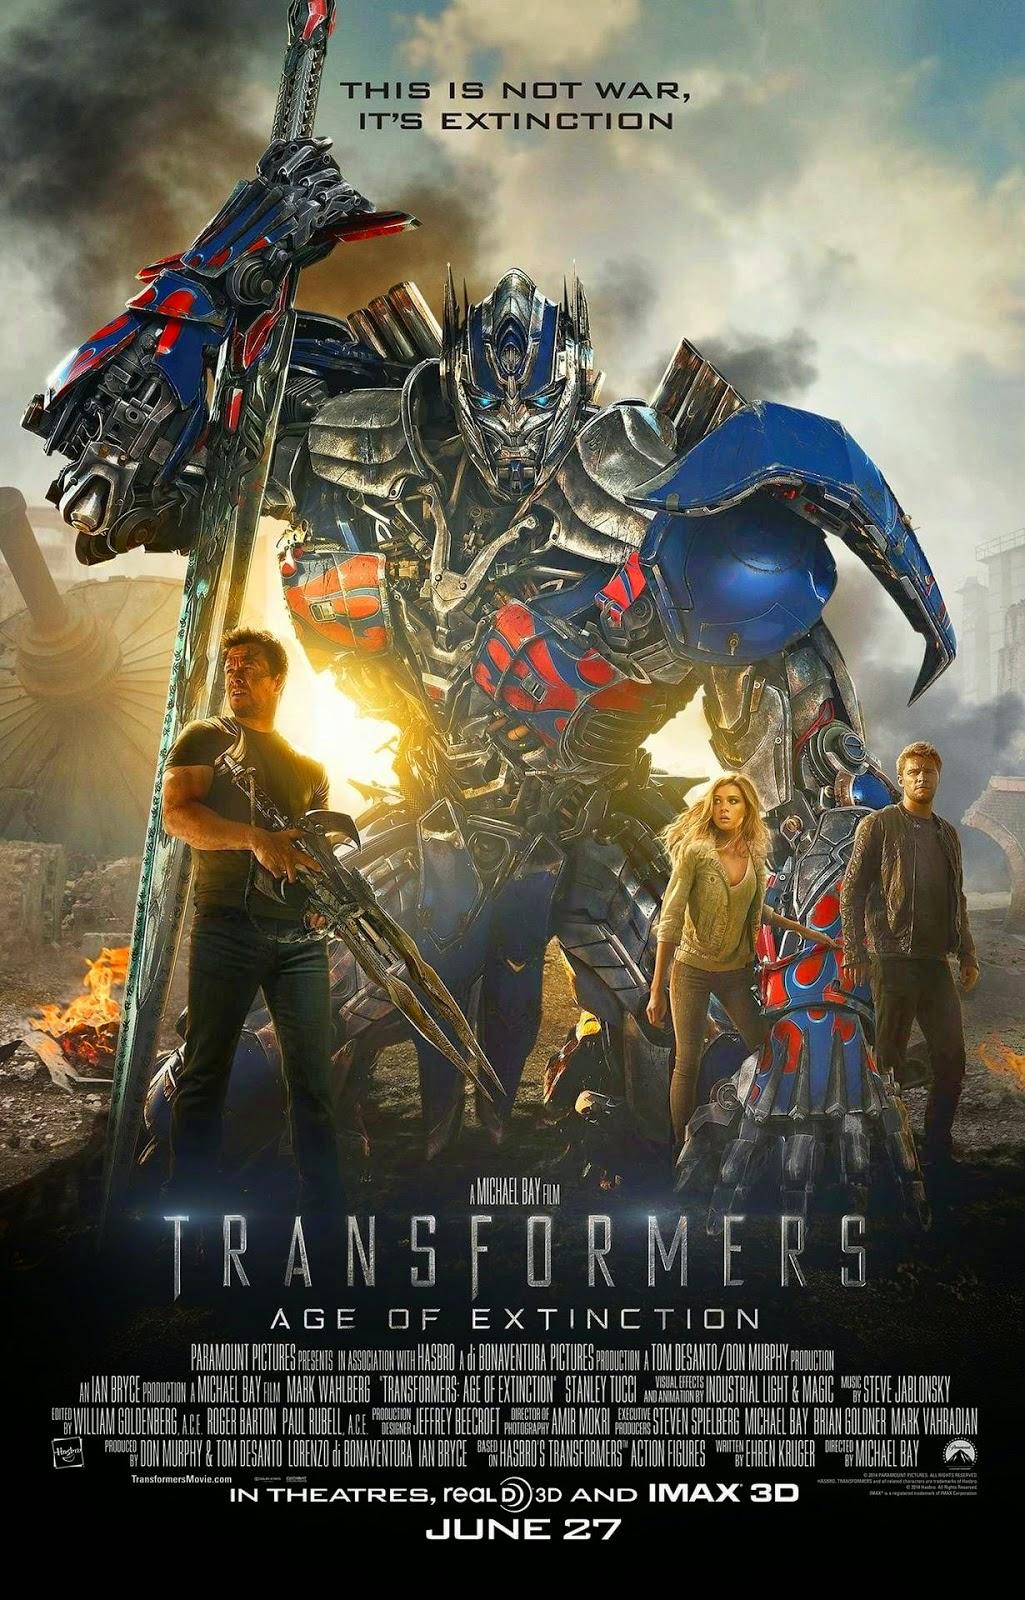 Transformers 4: Age of Extinction มหาวิบัติยุคสุญพันธุ์ พากย์ไทย